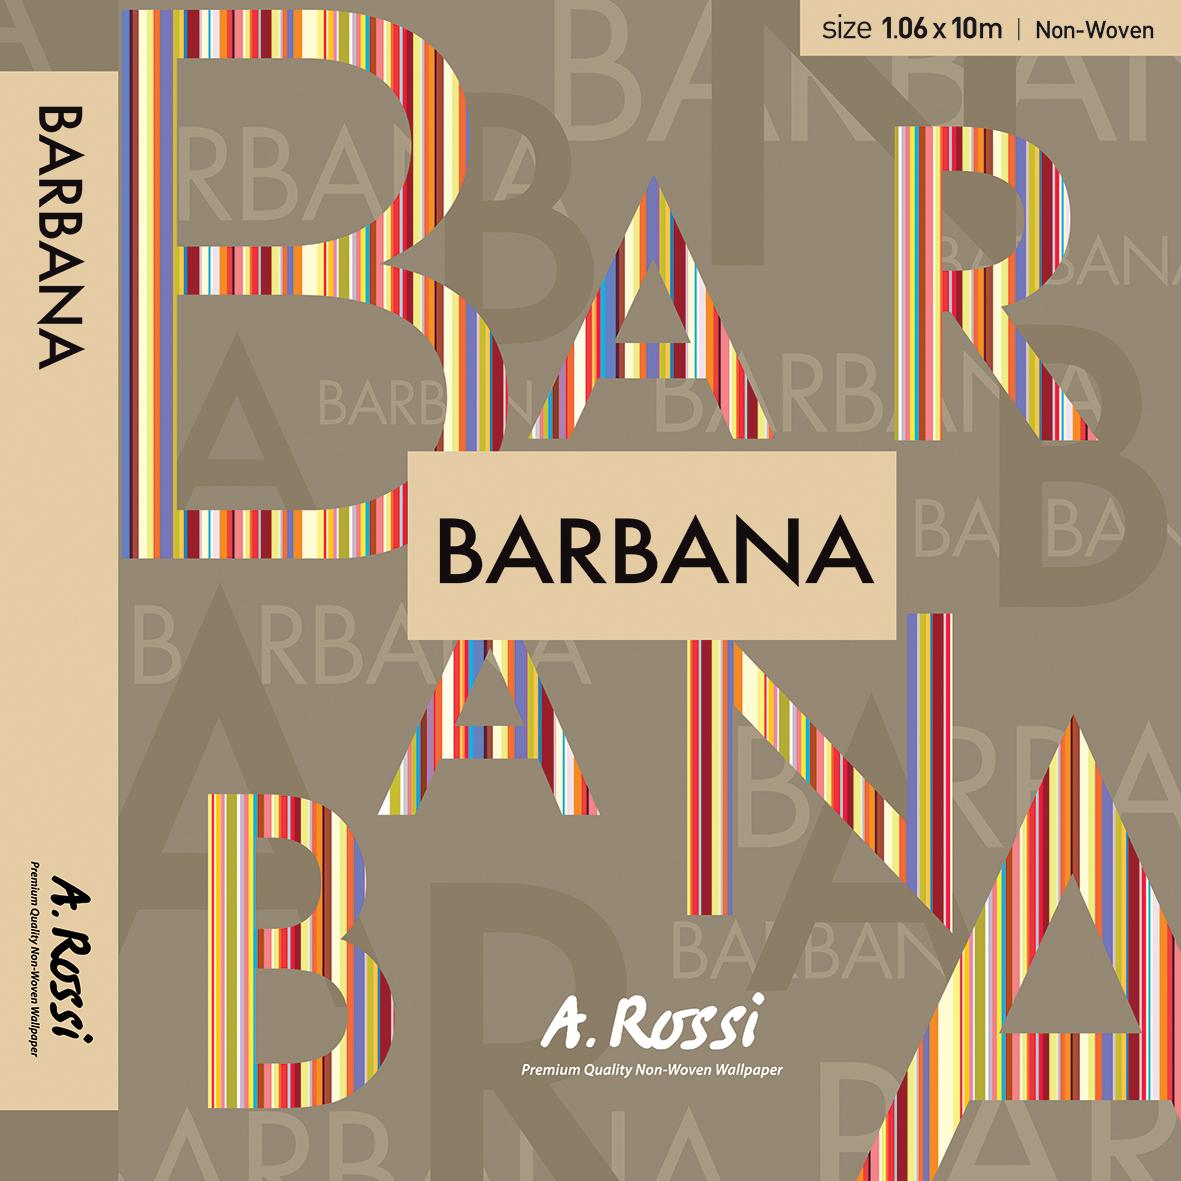 Barbana